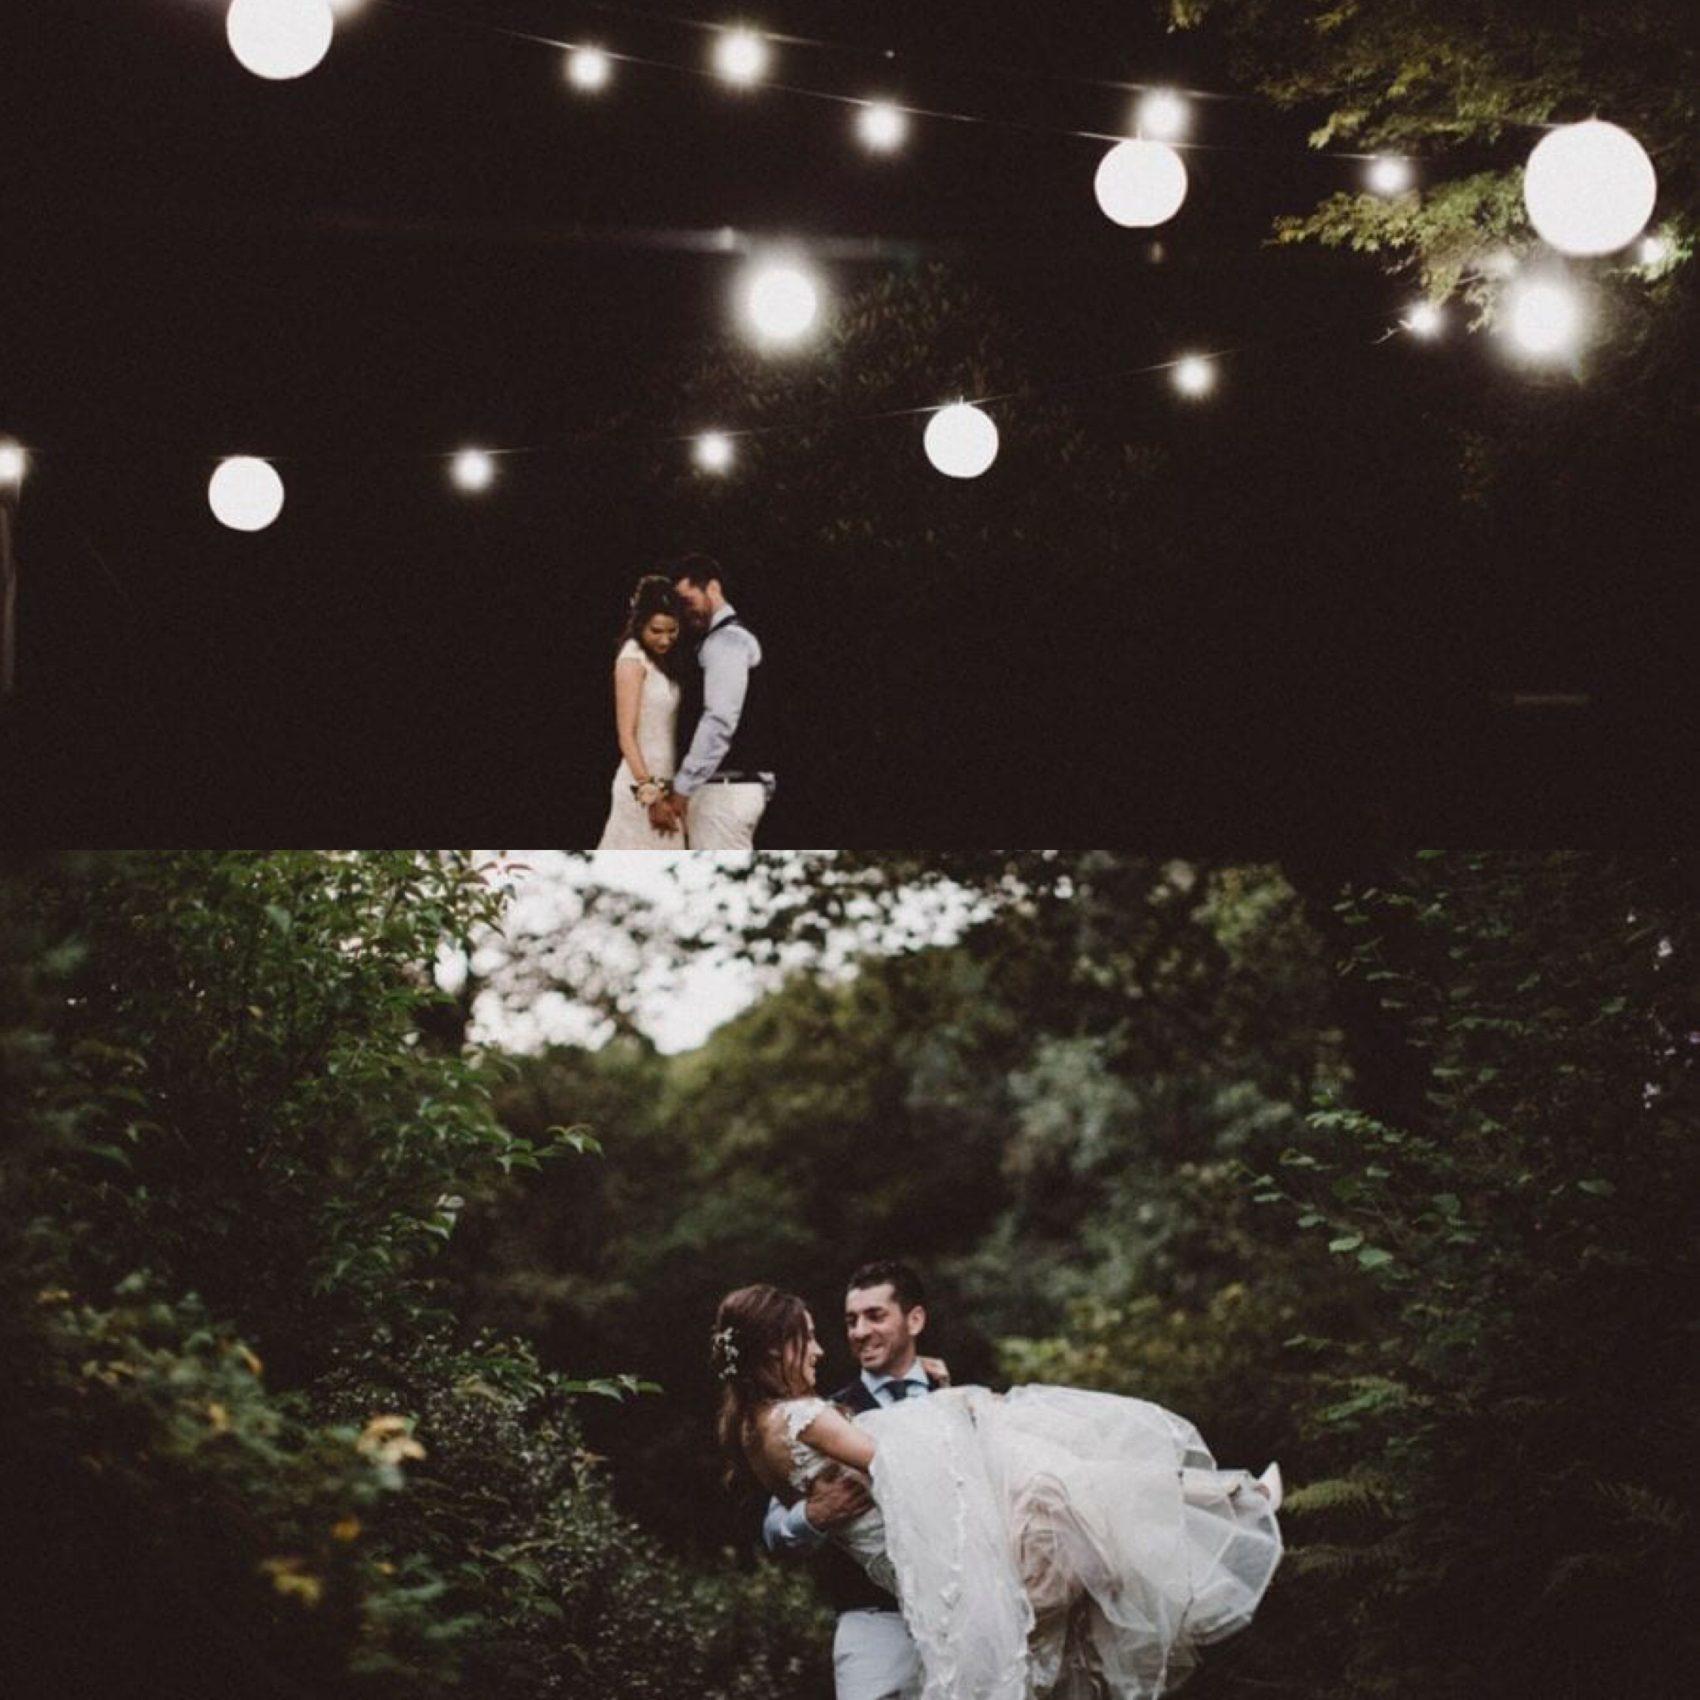 Moody, wedding, bride & Groom, filter, ever after, dark, lights, evening, night time, lower grenofen, woodland